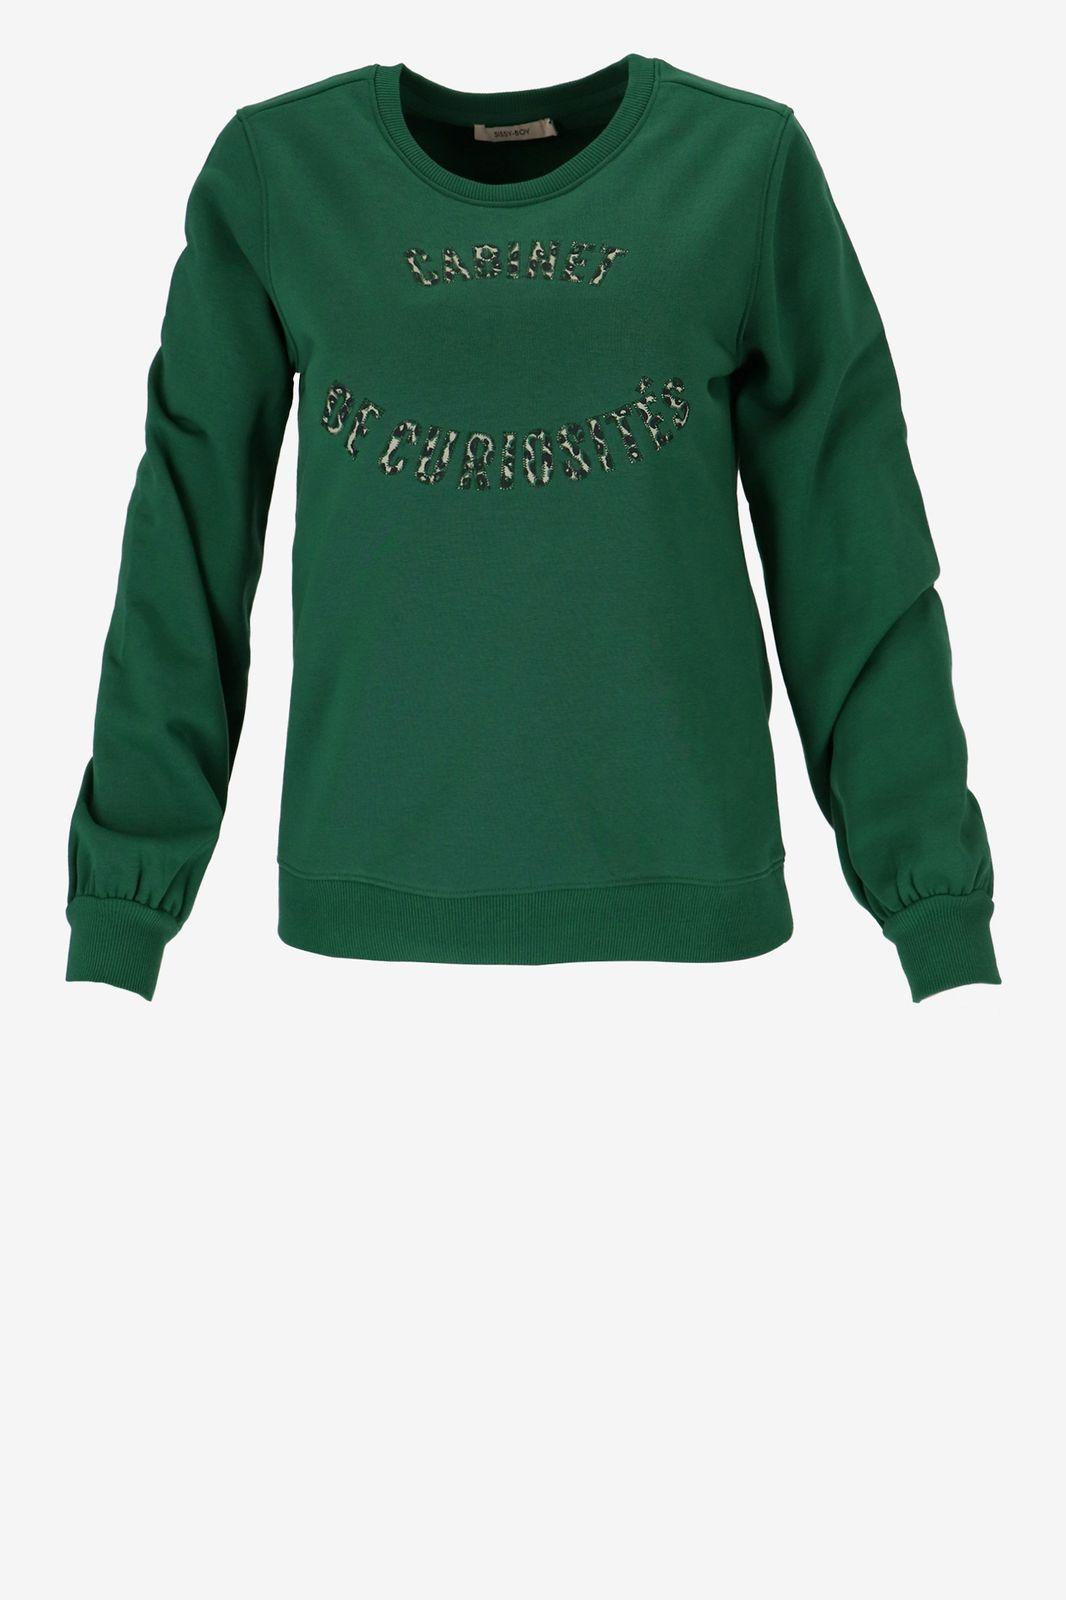 Groene sweater met tekst